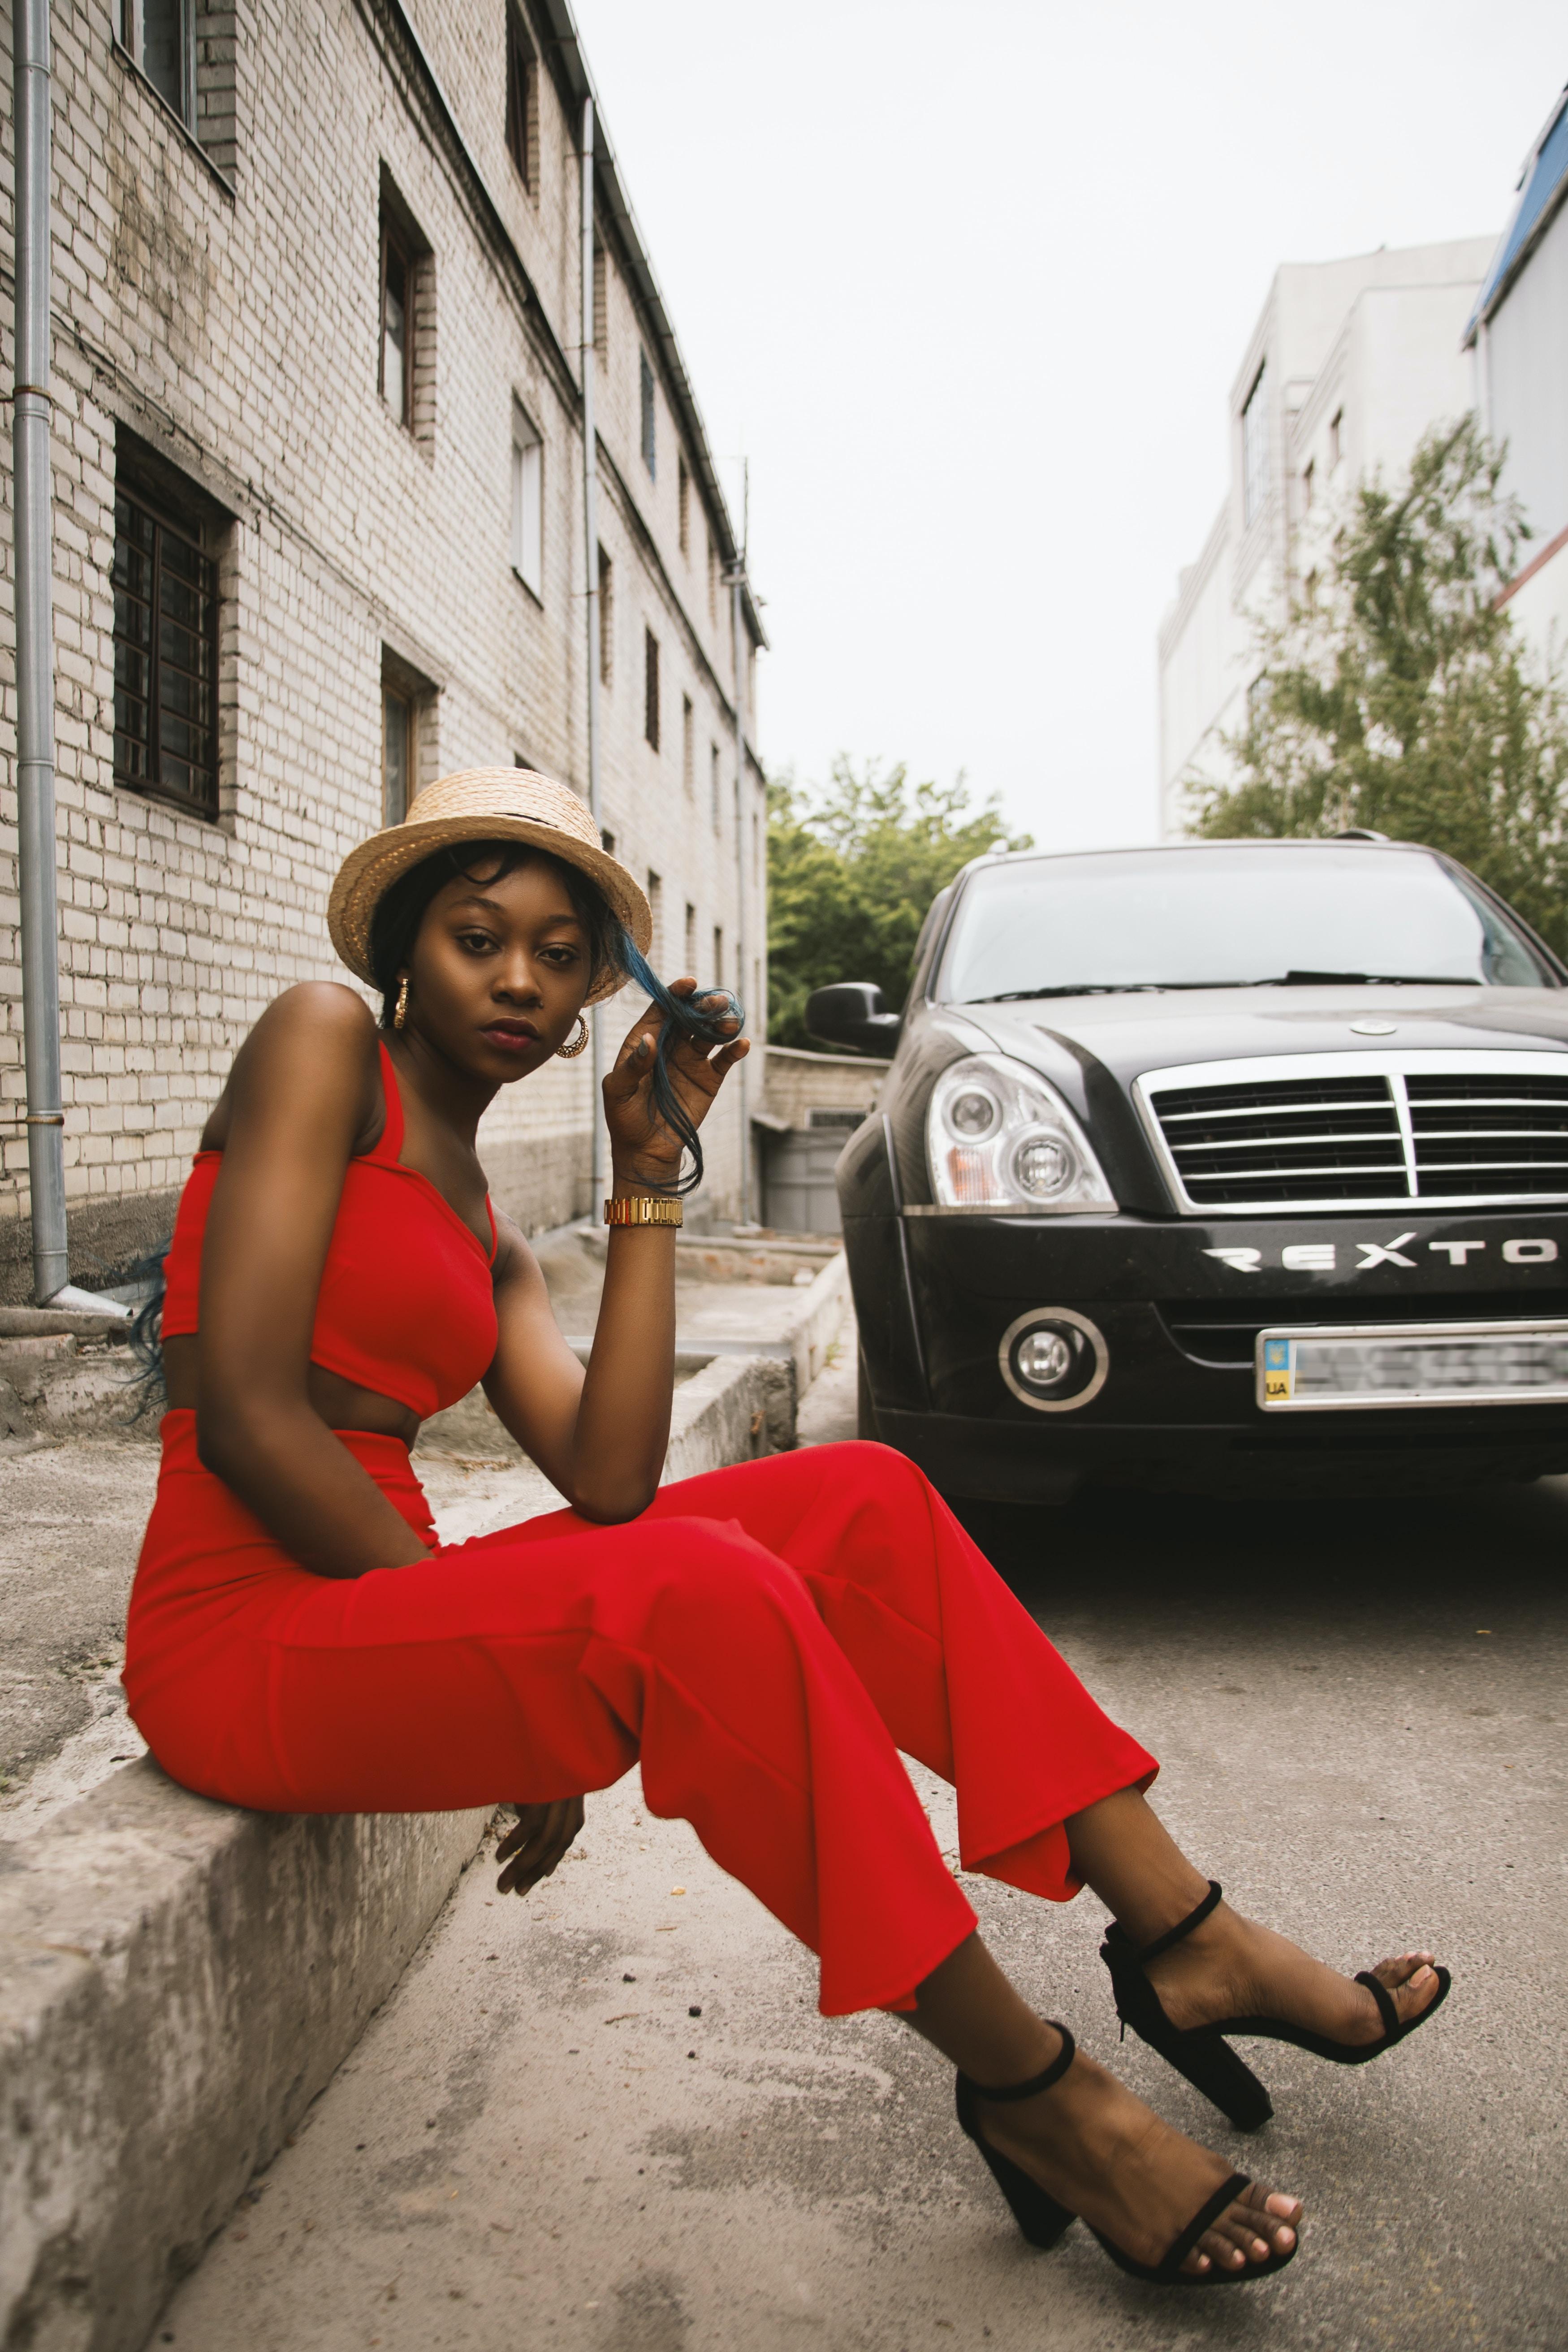 woman sitting on floor near black vehicle